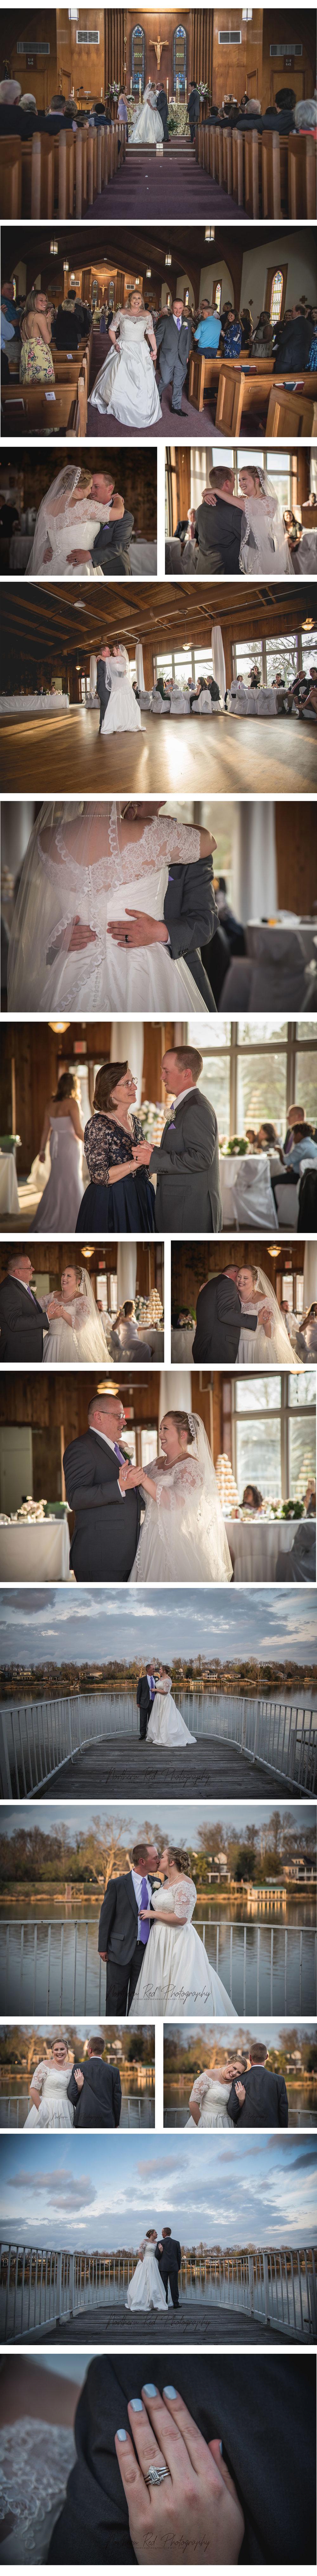 Wedding Blog Northern Red Photography